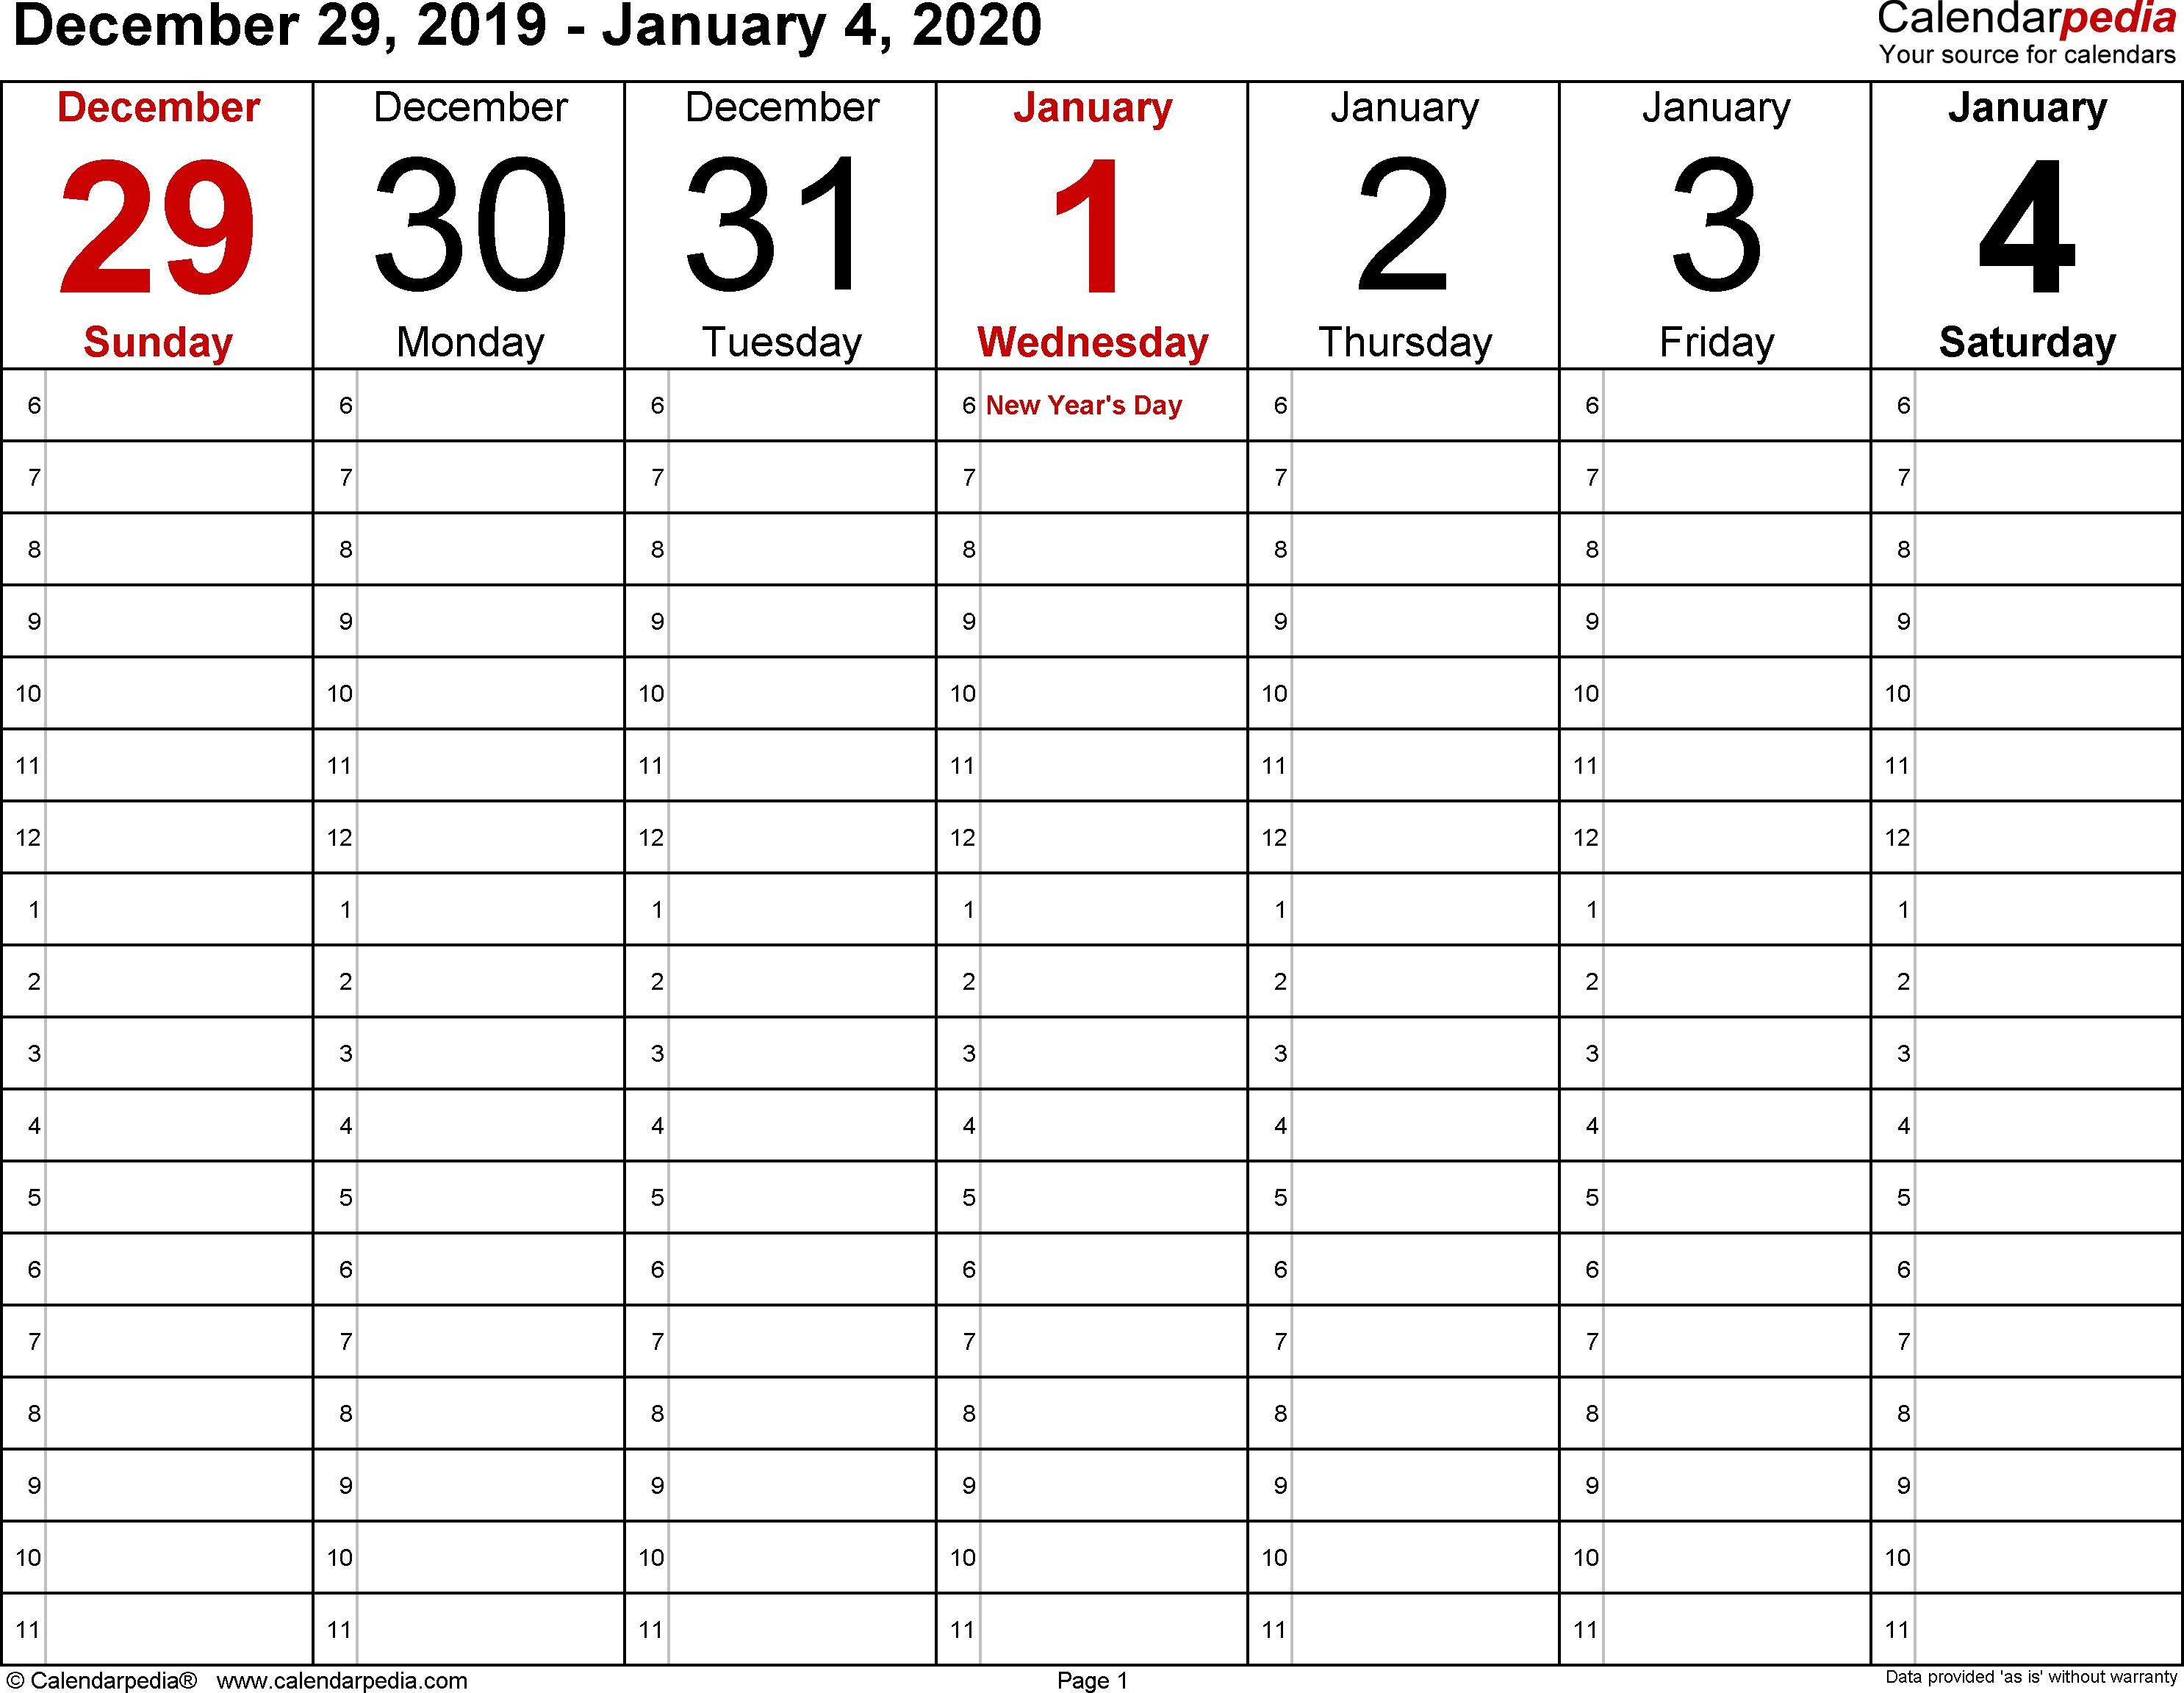 January 2020 Weekly Calendar | Calendar 2019 Template-Daily Hourly Calendar Template 2020 Printable